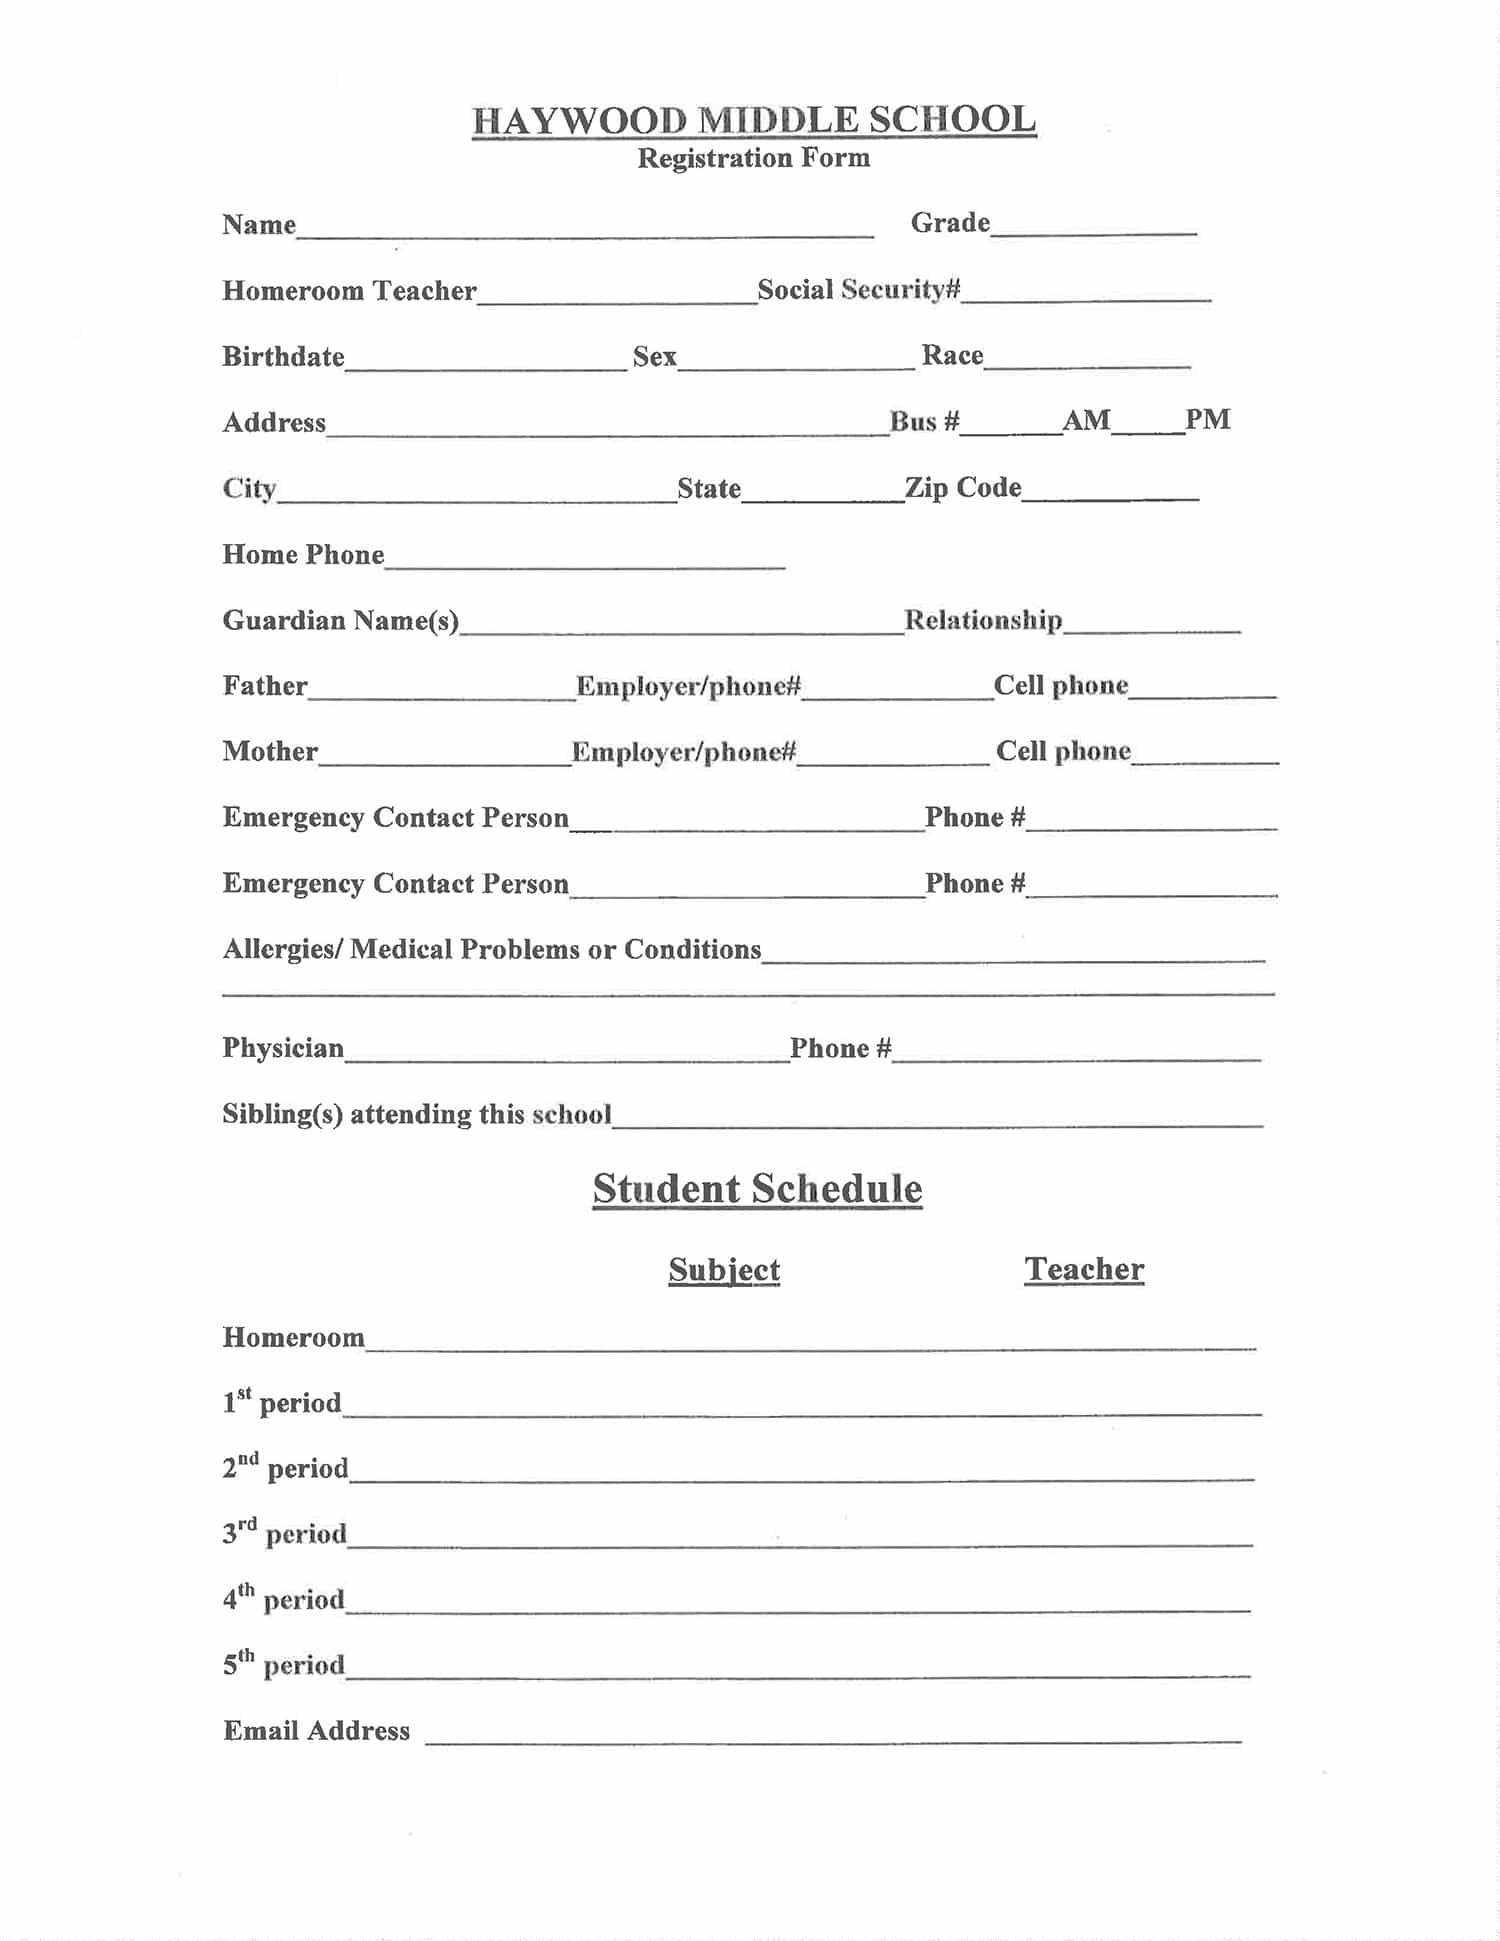 HMS Registration Documents-1